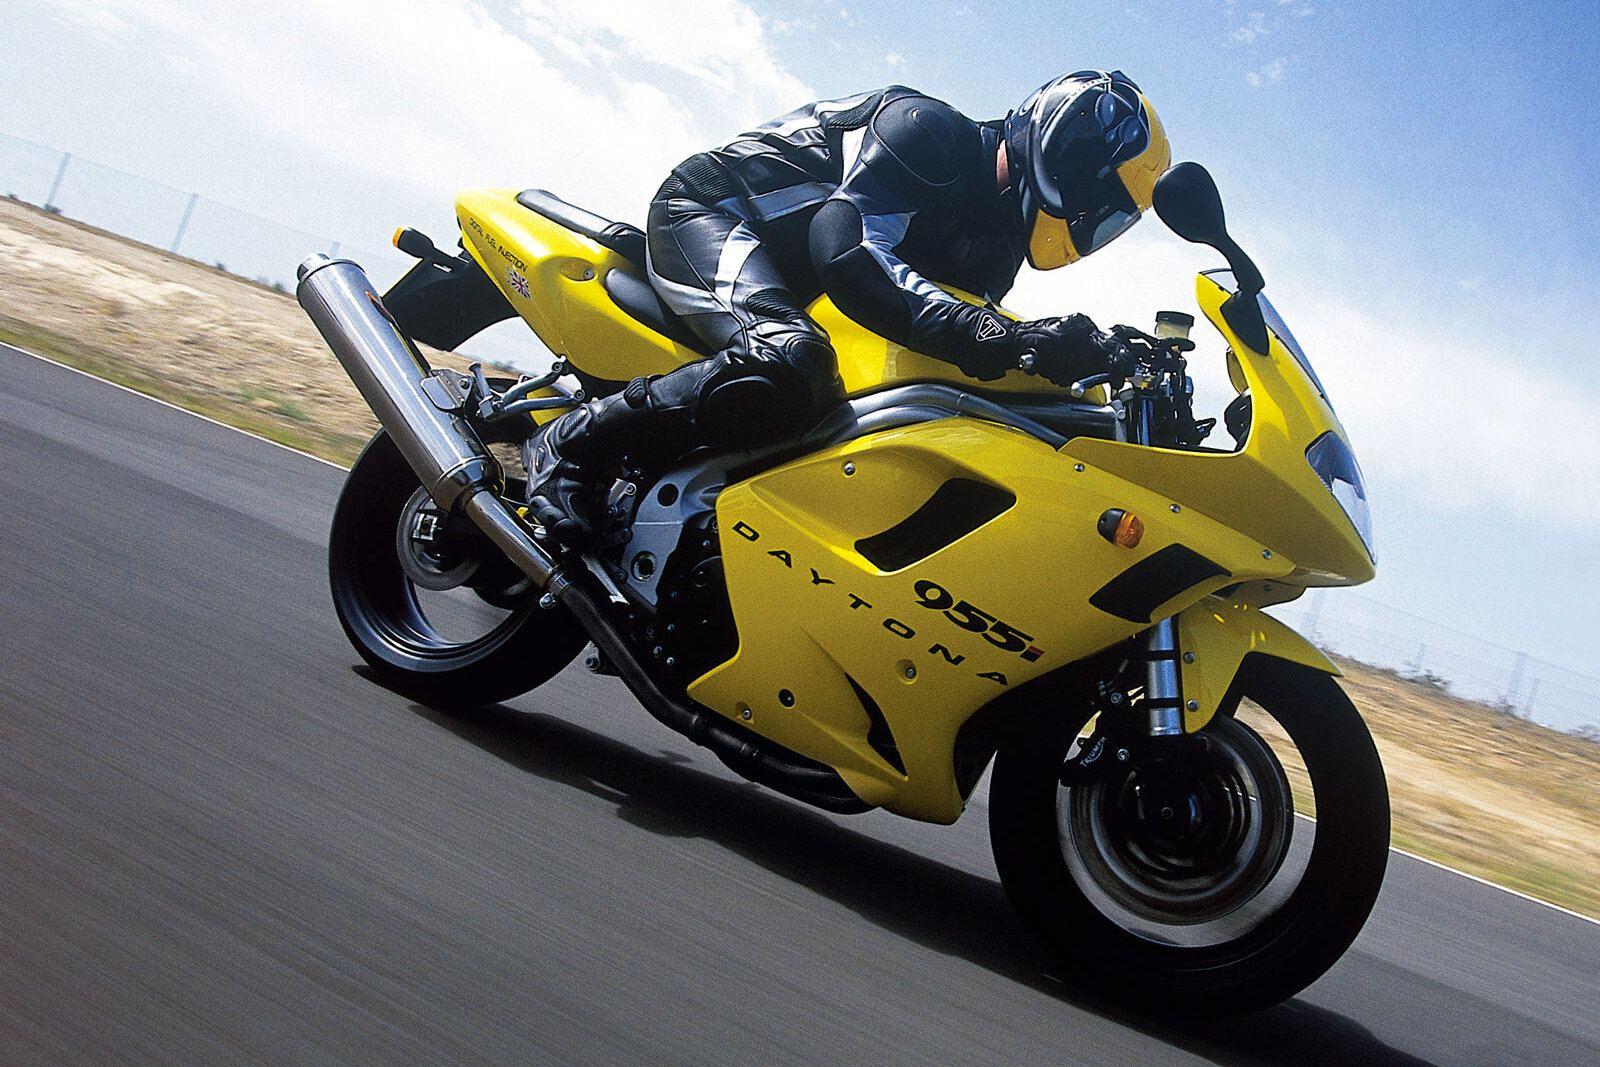 Moto del día: Alfer Enduro 125 | espíritu RACER moto